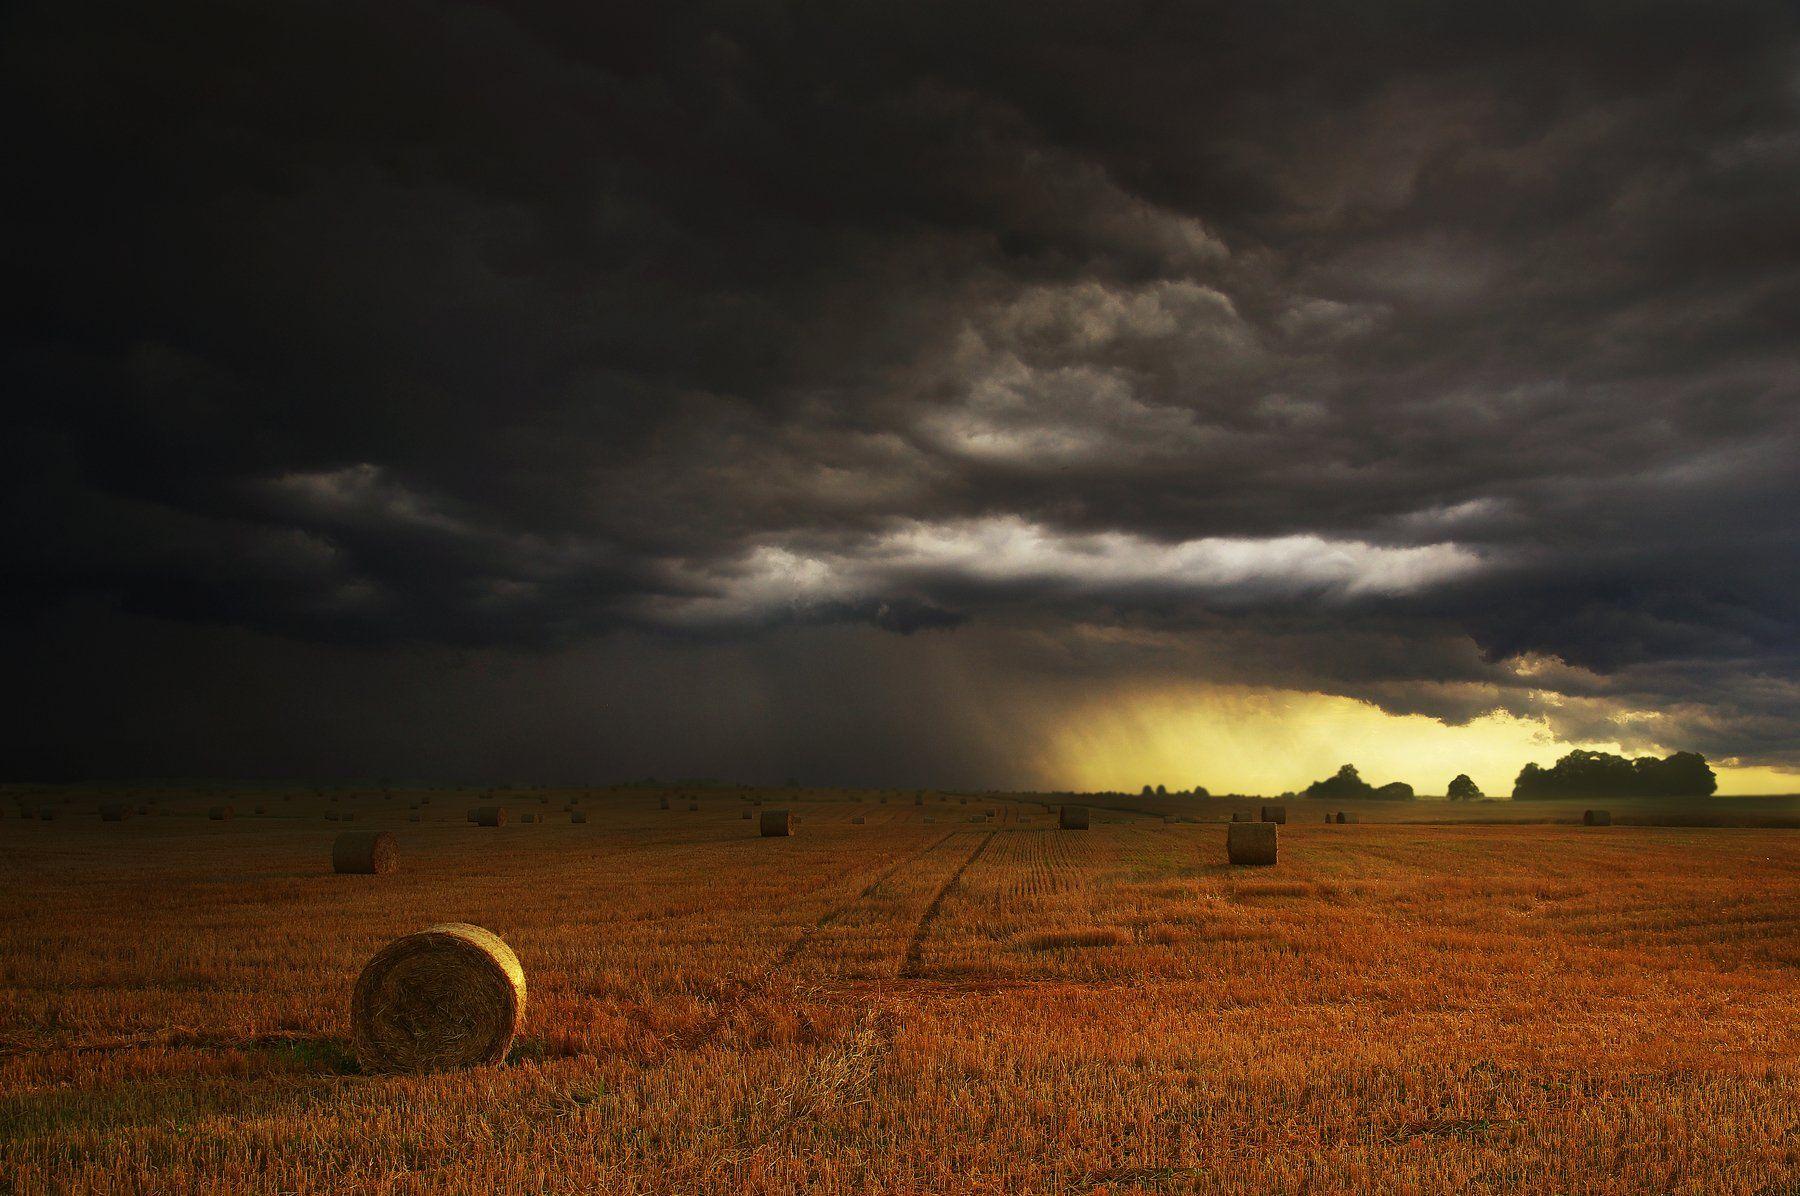 Lithuania, sky, summer, clouds, storm, Mindaugas Žarys